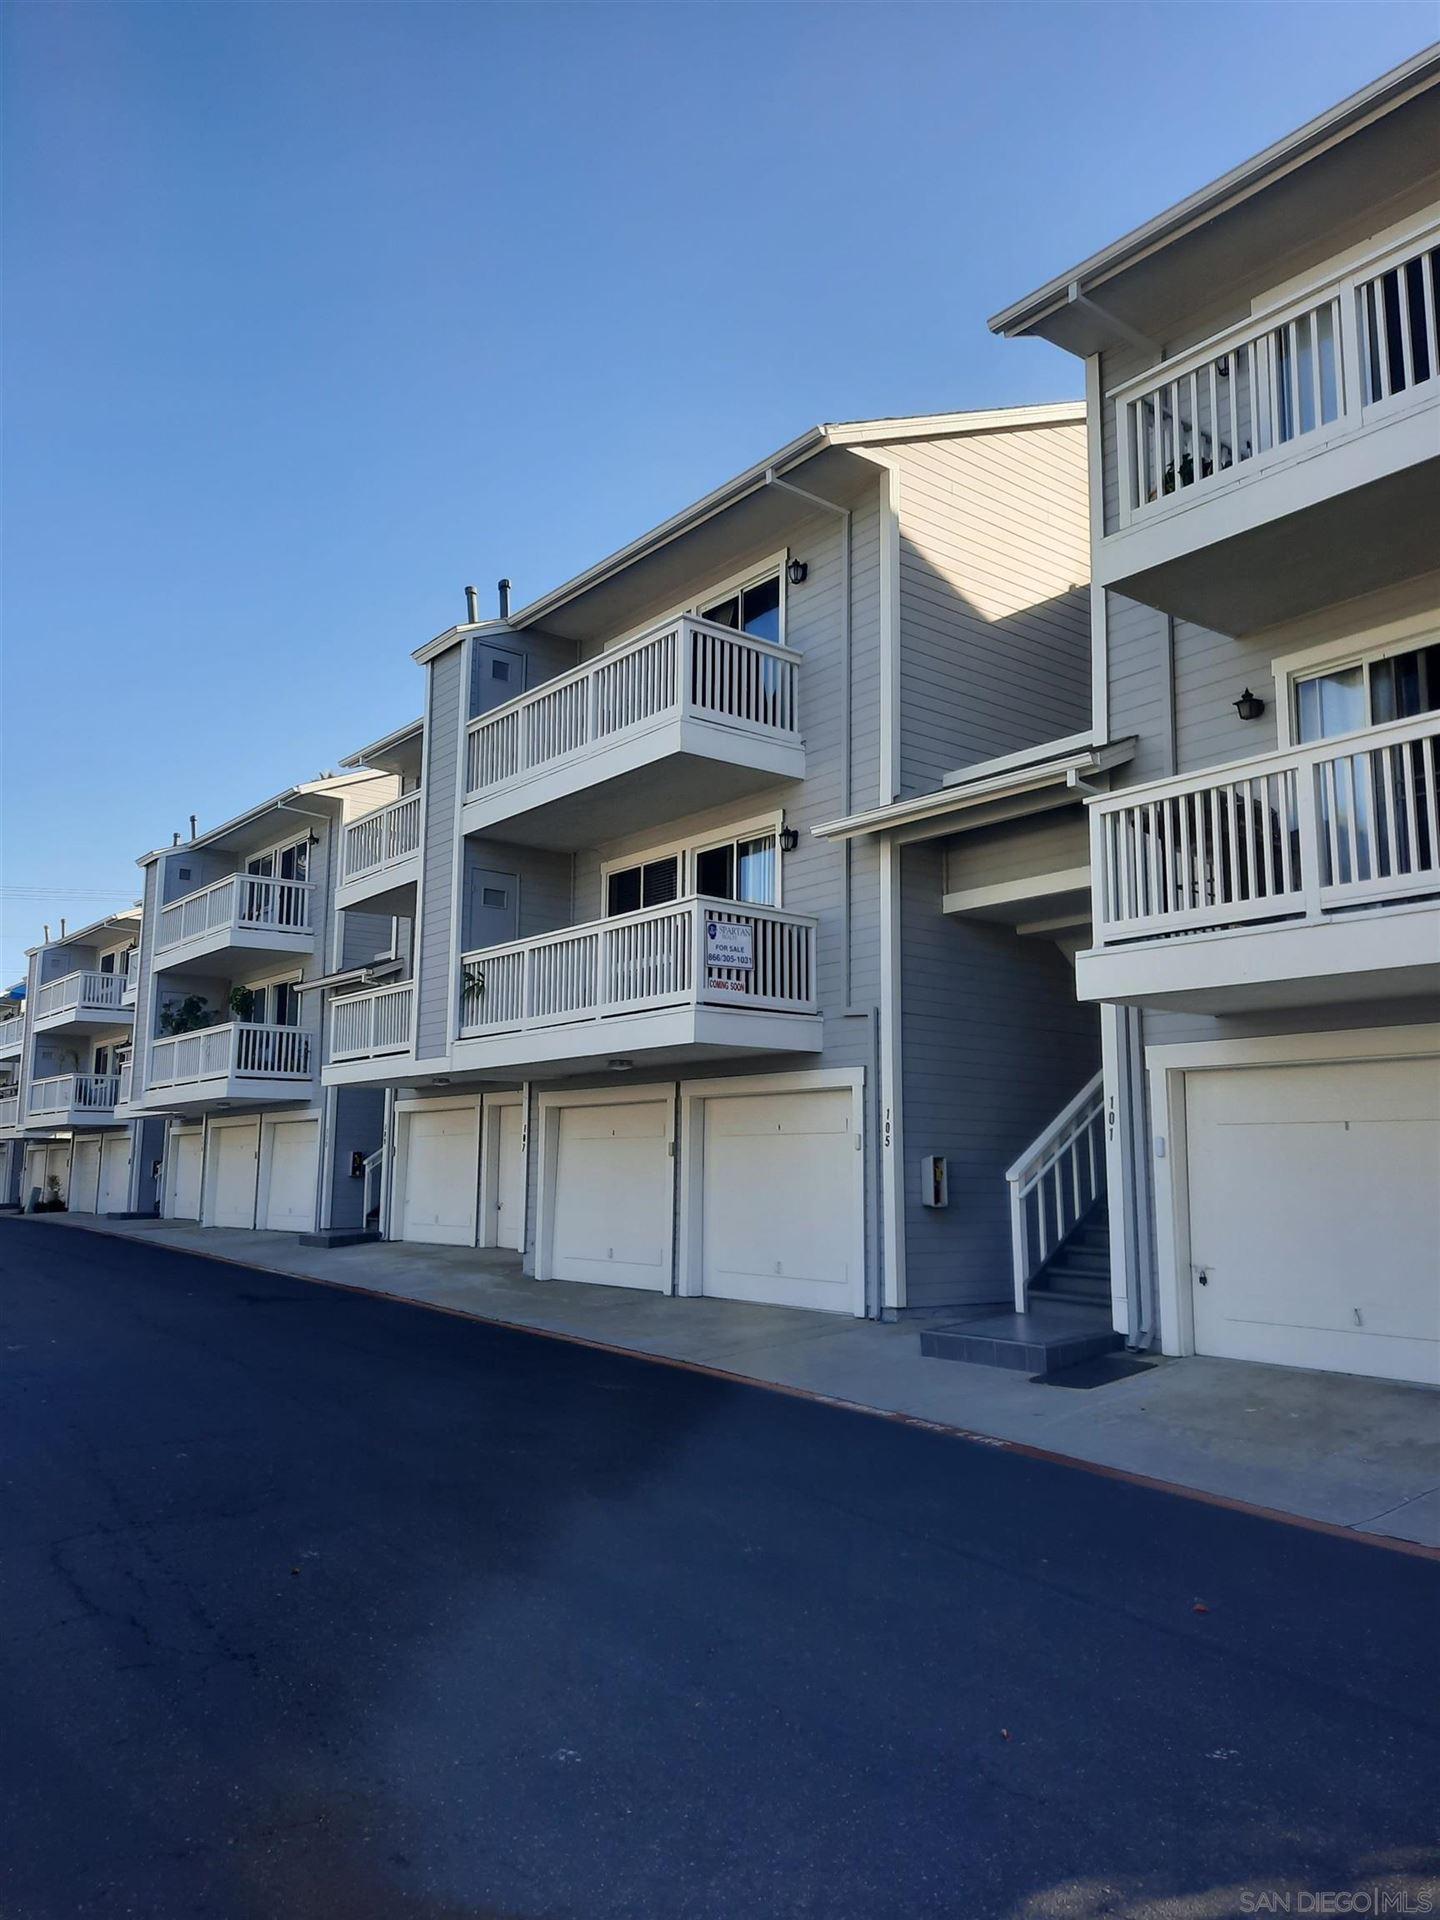 Photo of 105 Mangano Circle, Encinitas, CA 92024 (MLS # 210026538)